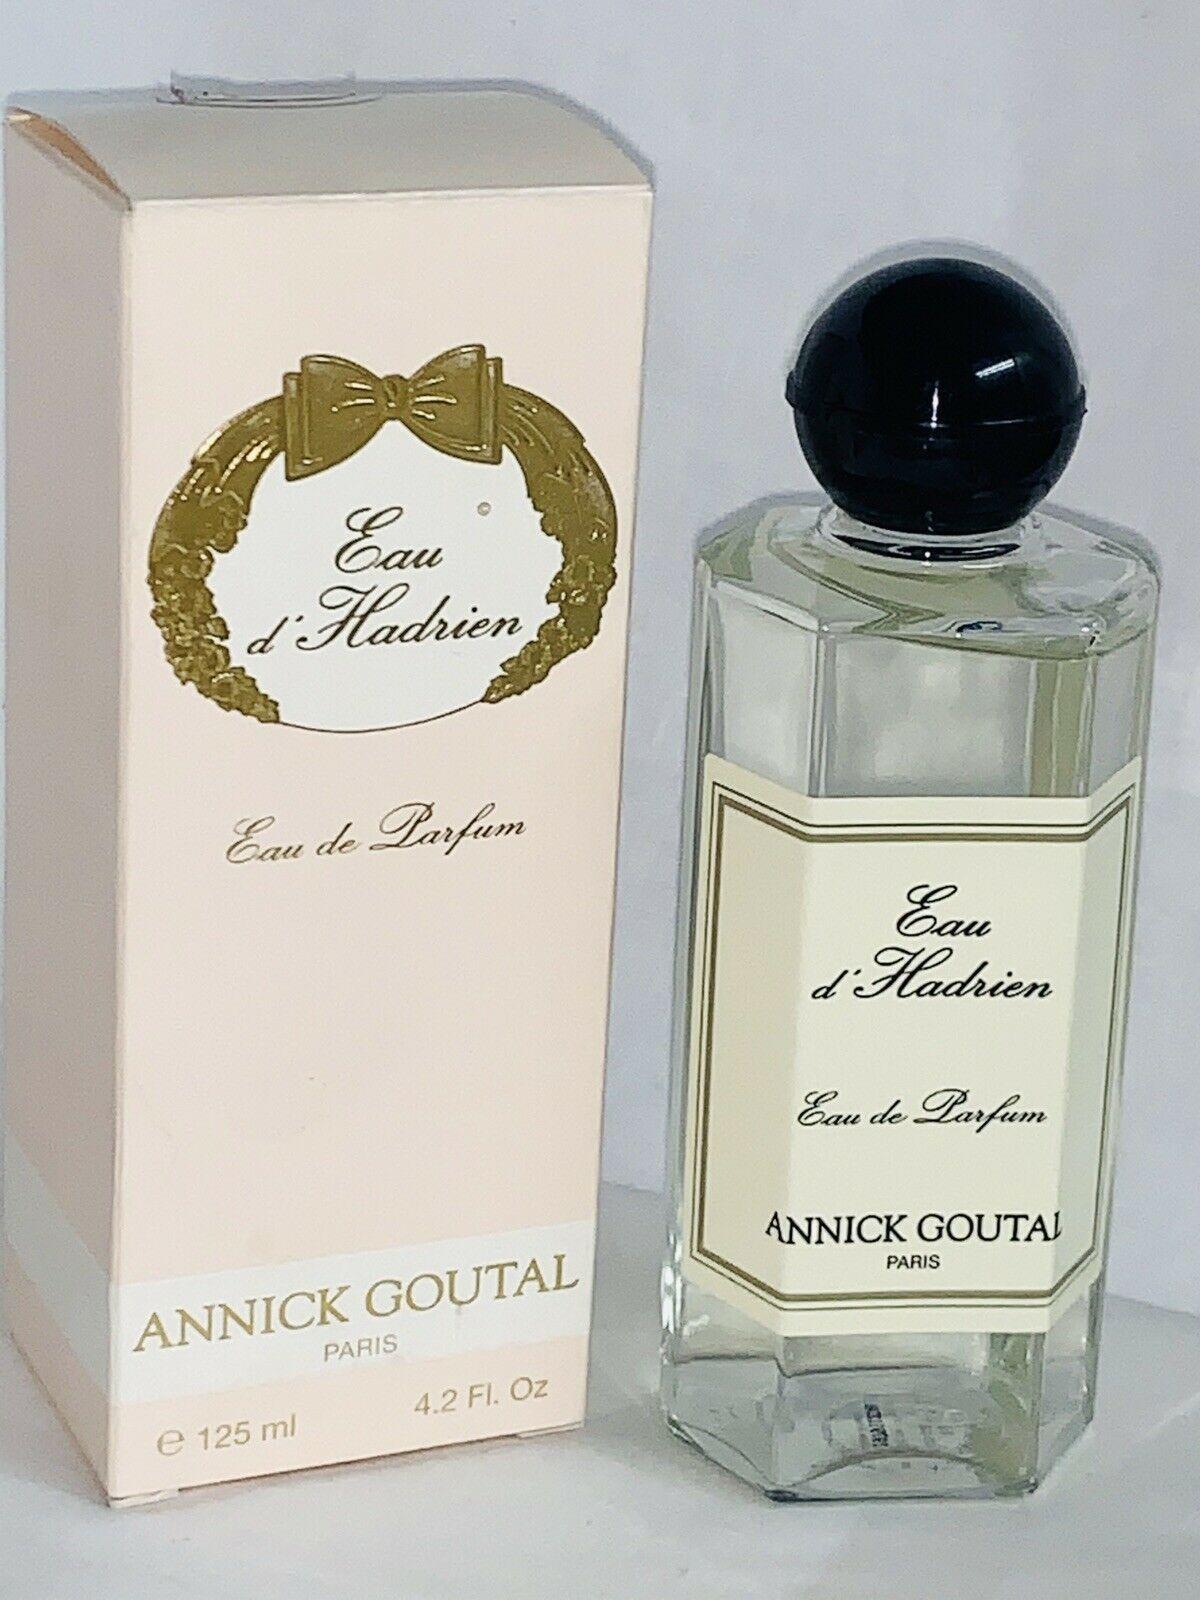 Annick goutal eau d hadrien 4.2 oz splash perfume